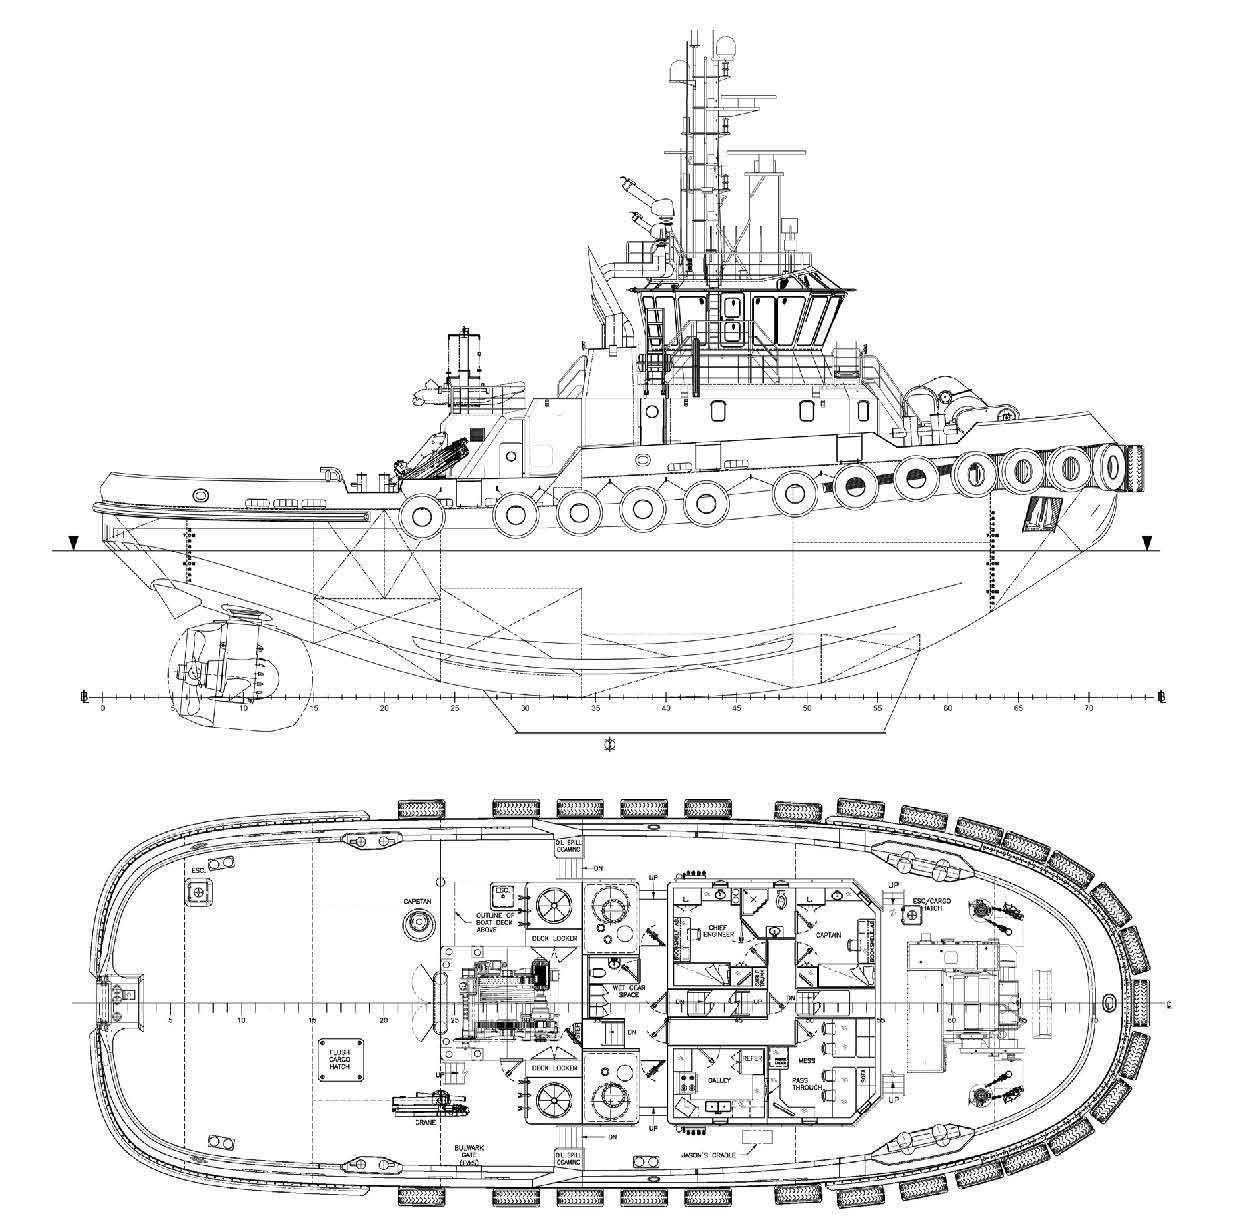 113 Tbp Asd Tug Escort Fifi 1 Ice Class